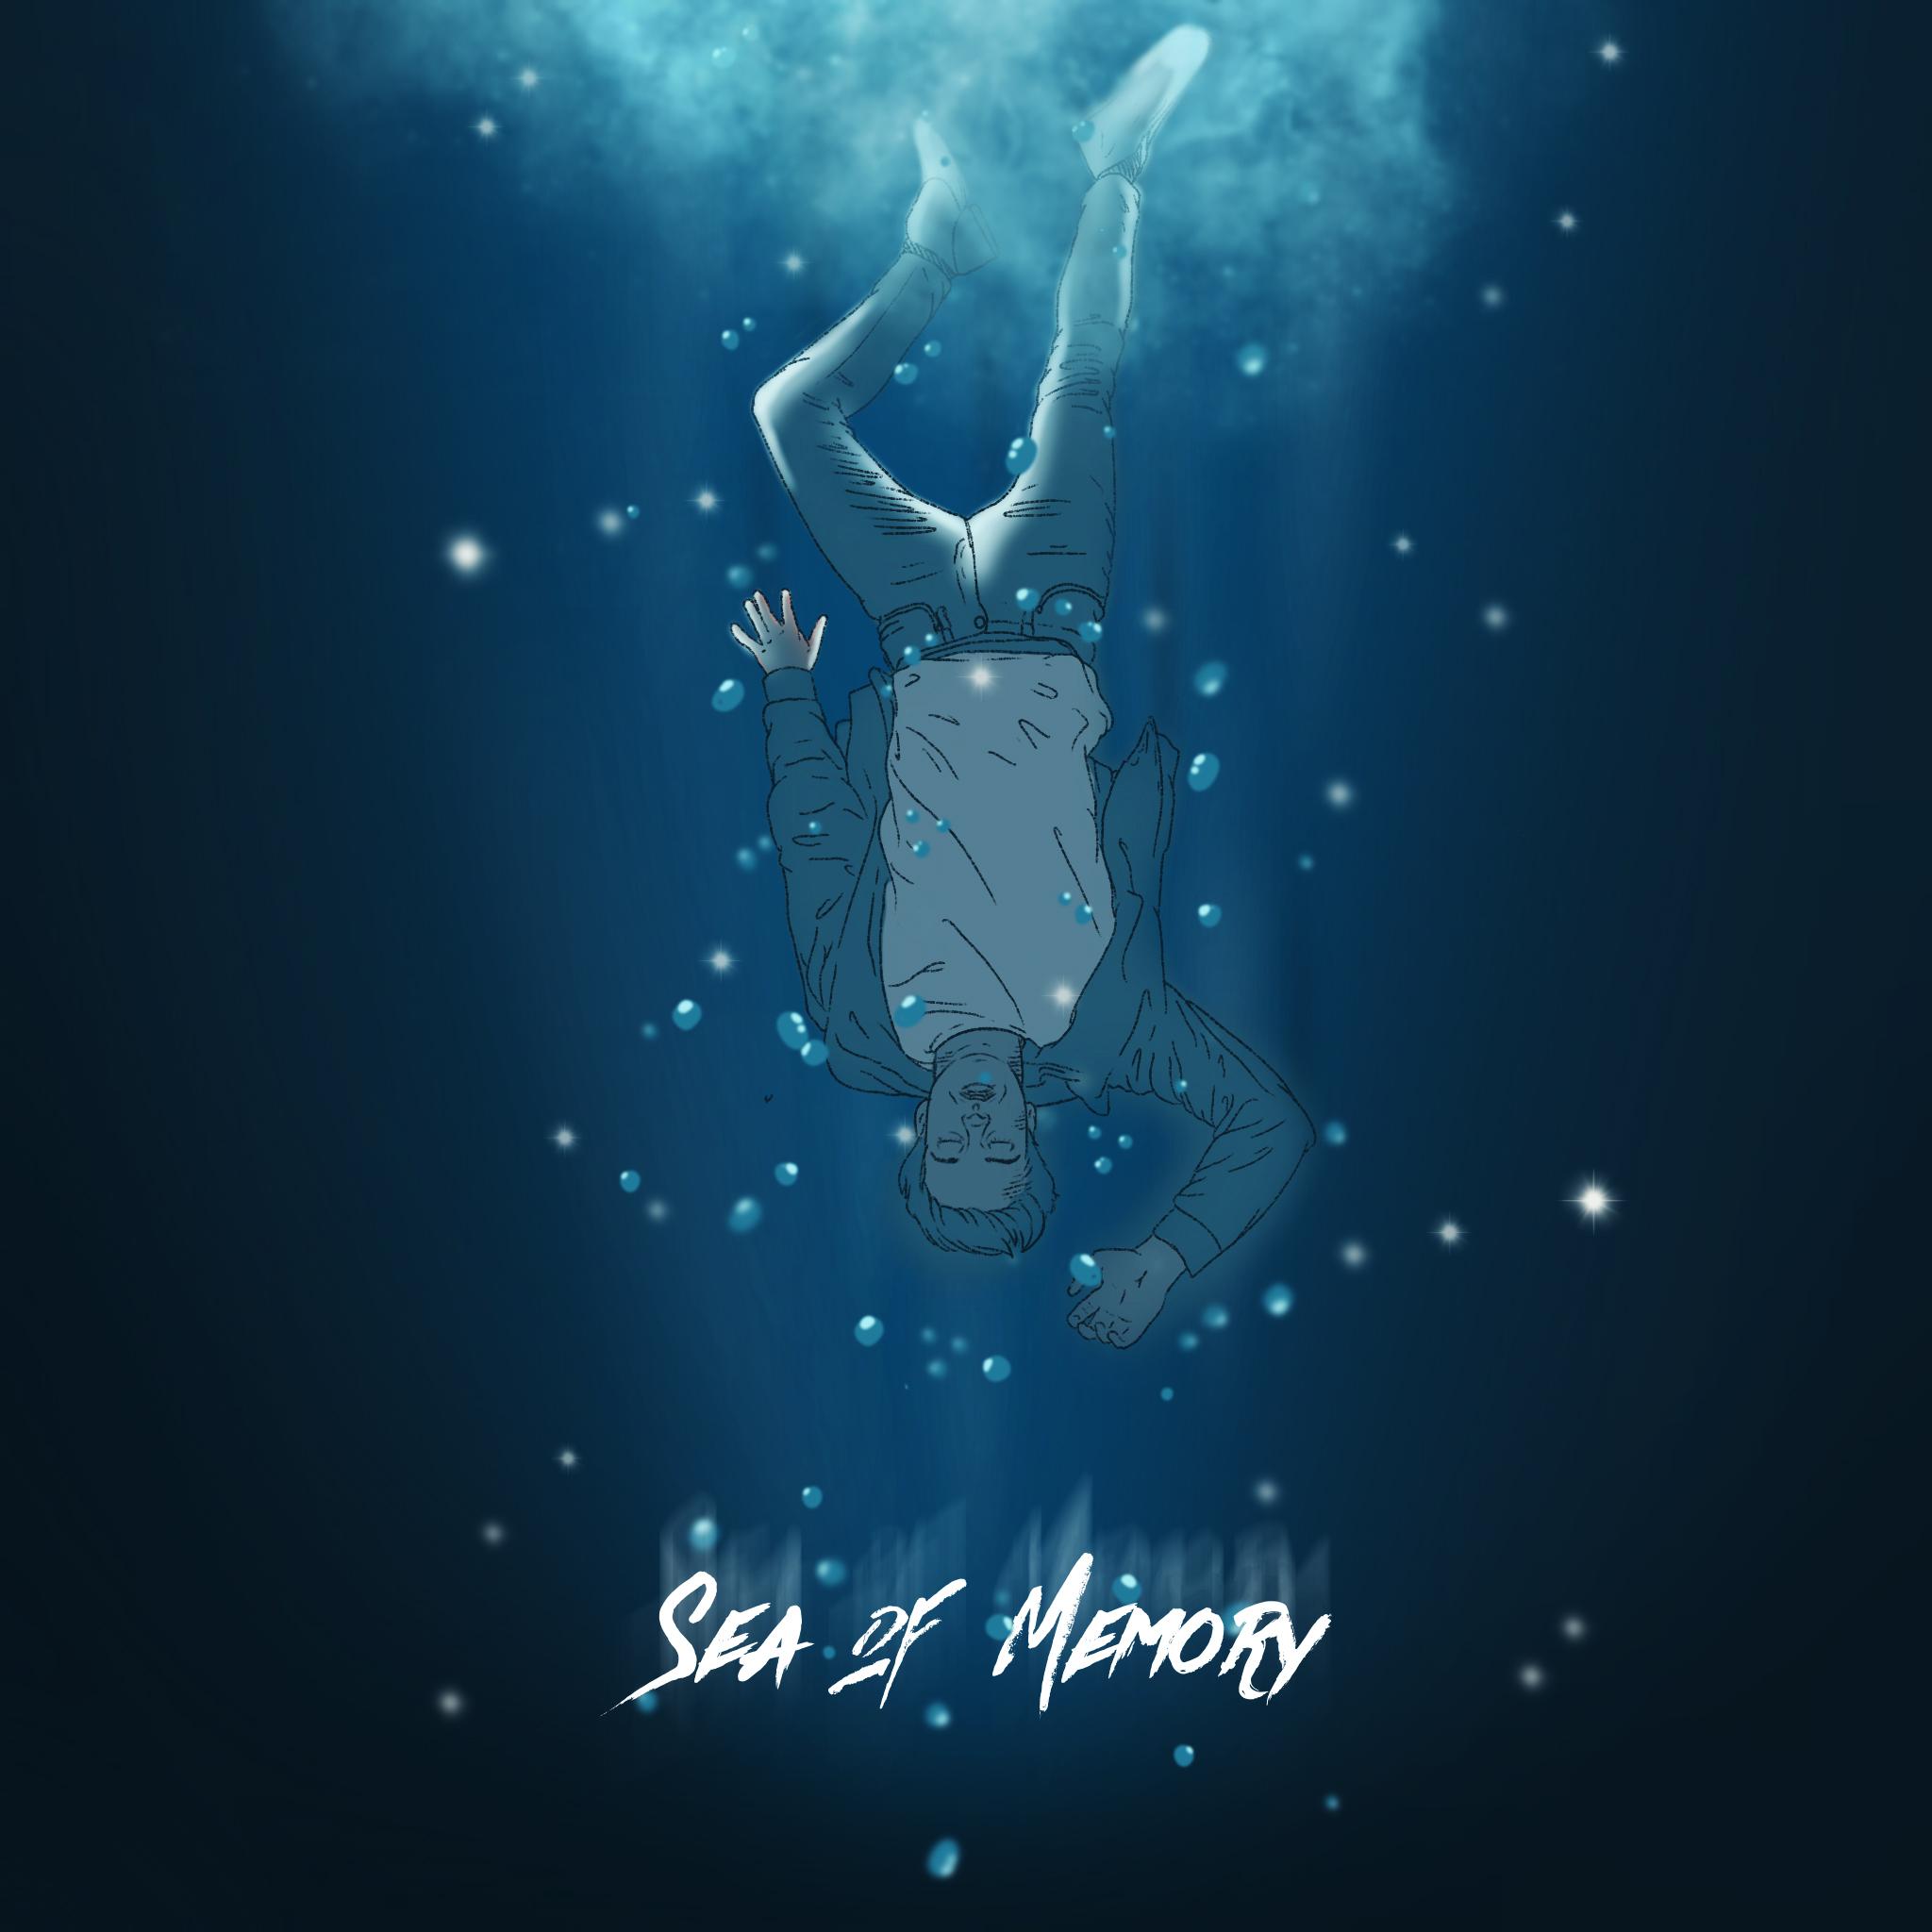 seaofmemery.jpg